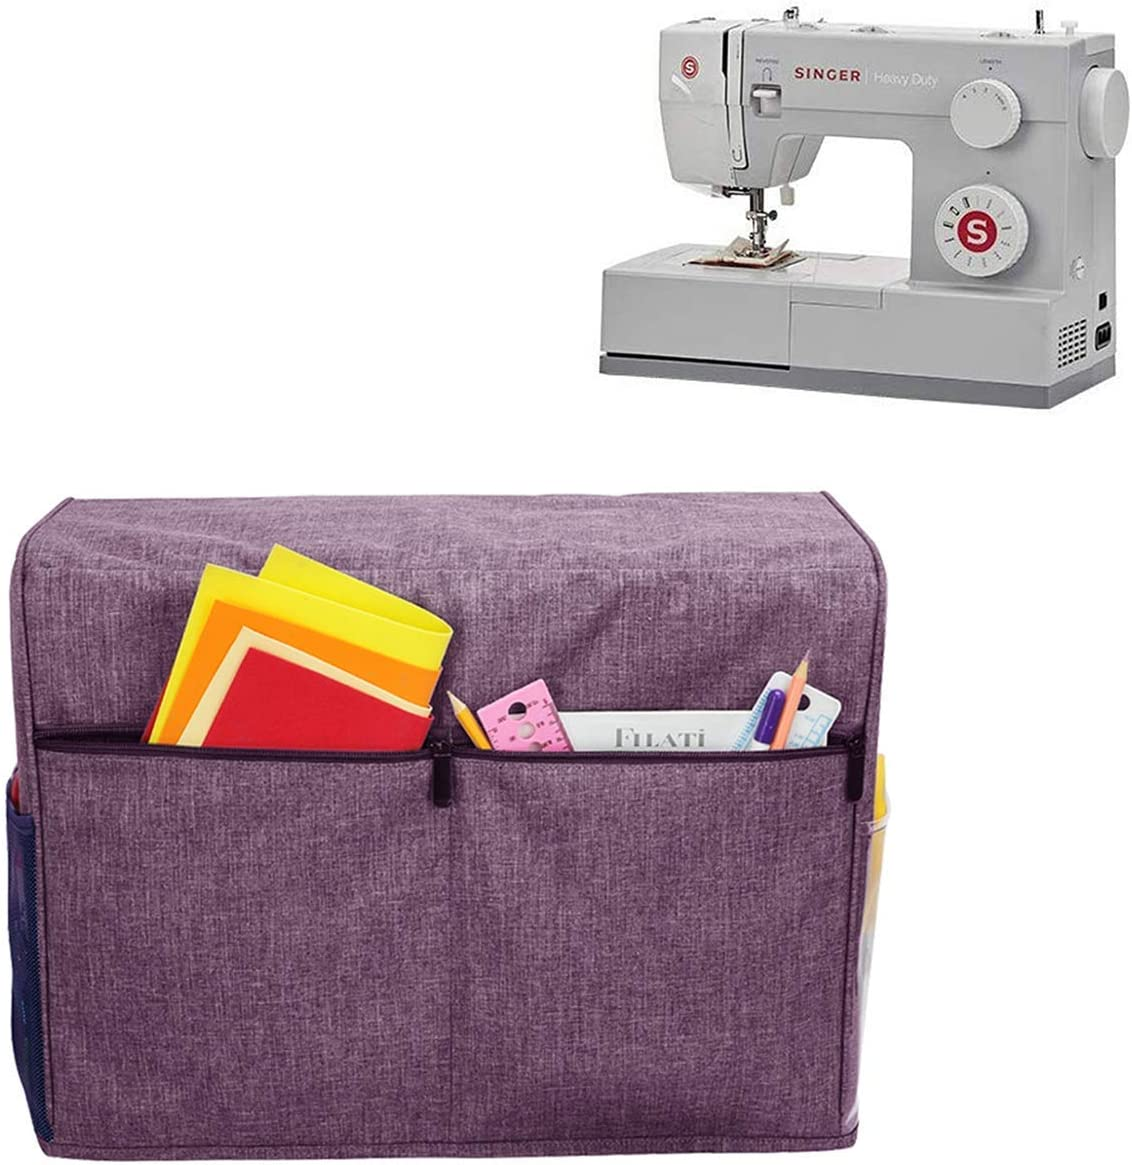 Funda para máquina de coser Canamita, cubierta de nailon con ...